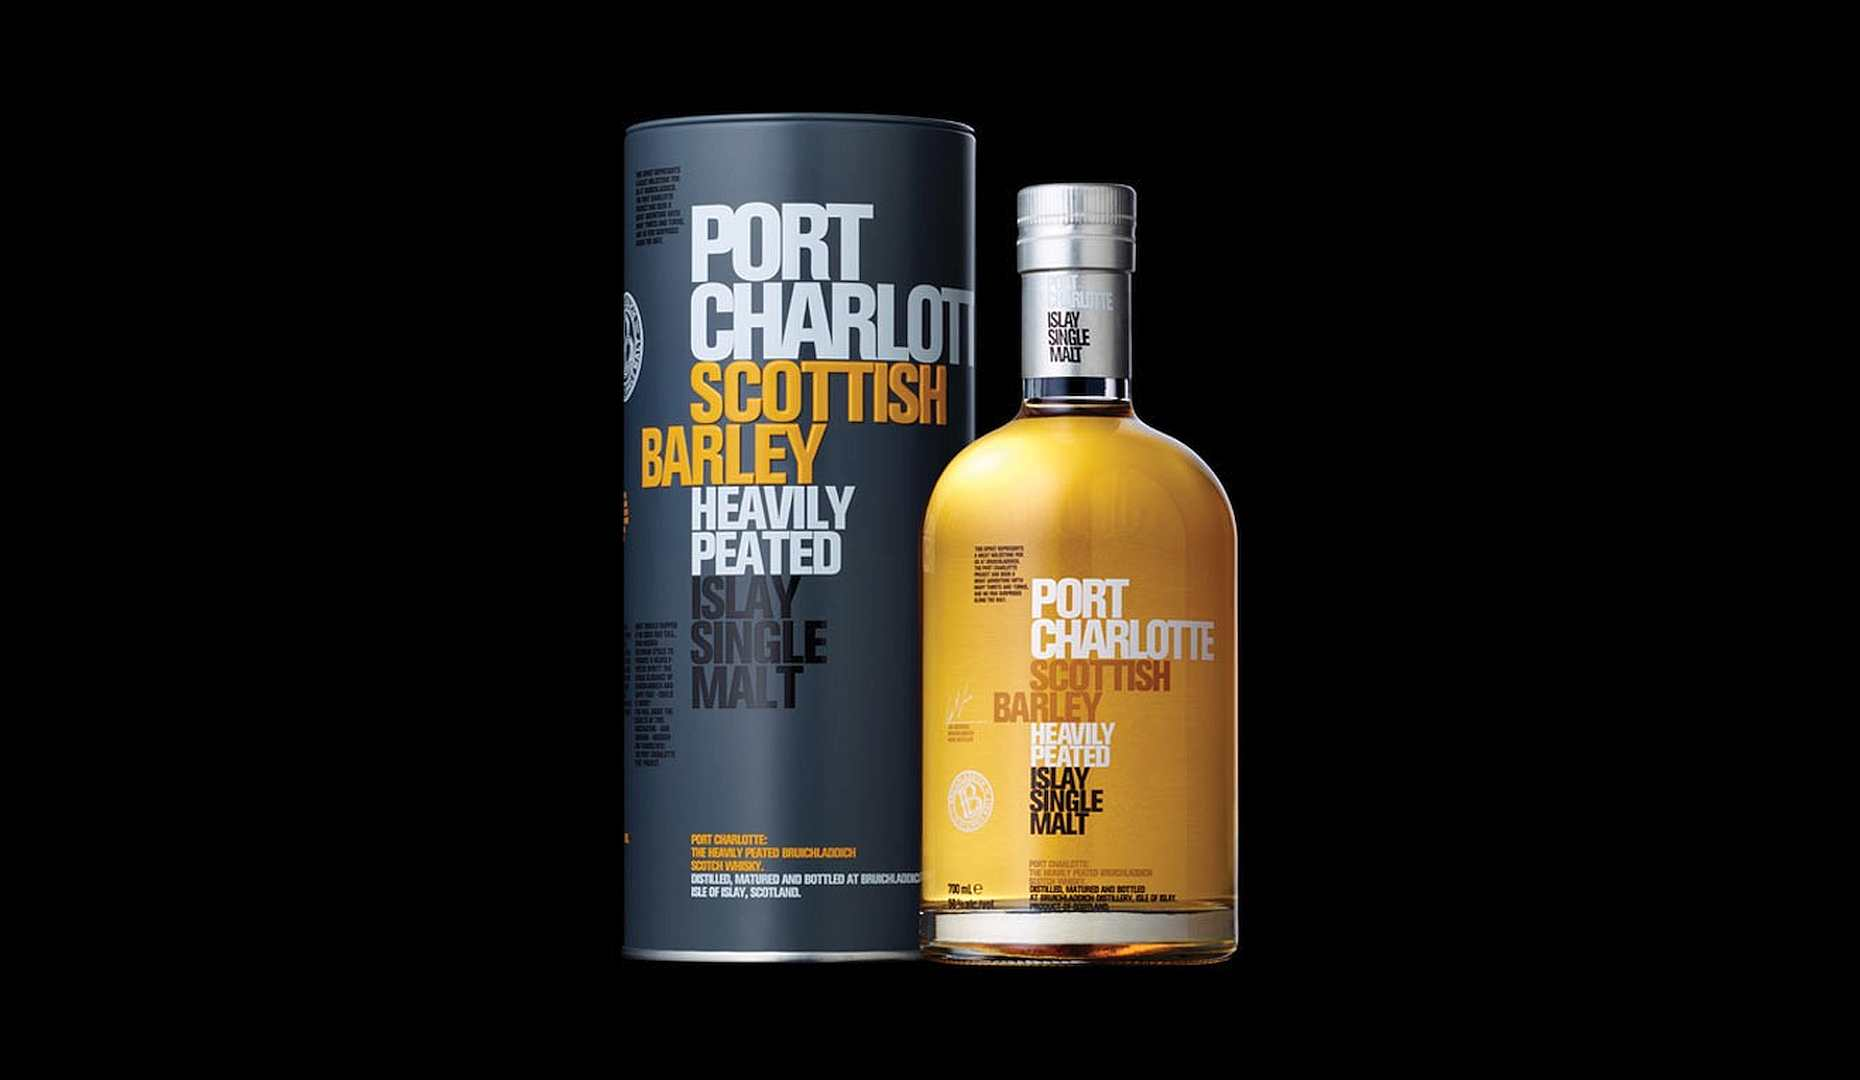 Bruichladdich port charlotte scottish barley jetzt mit - Port charlotte scottish barley ...